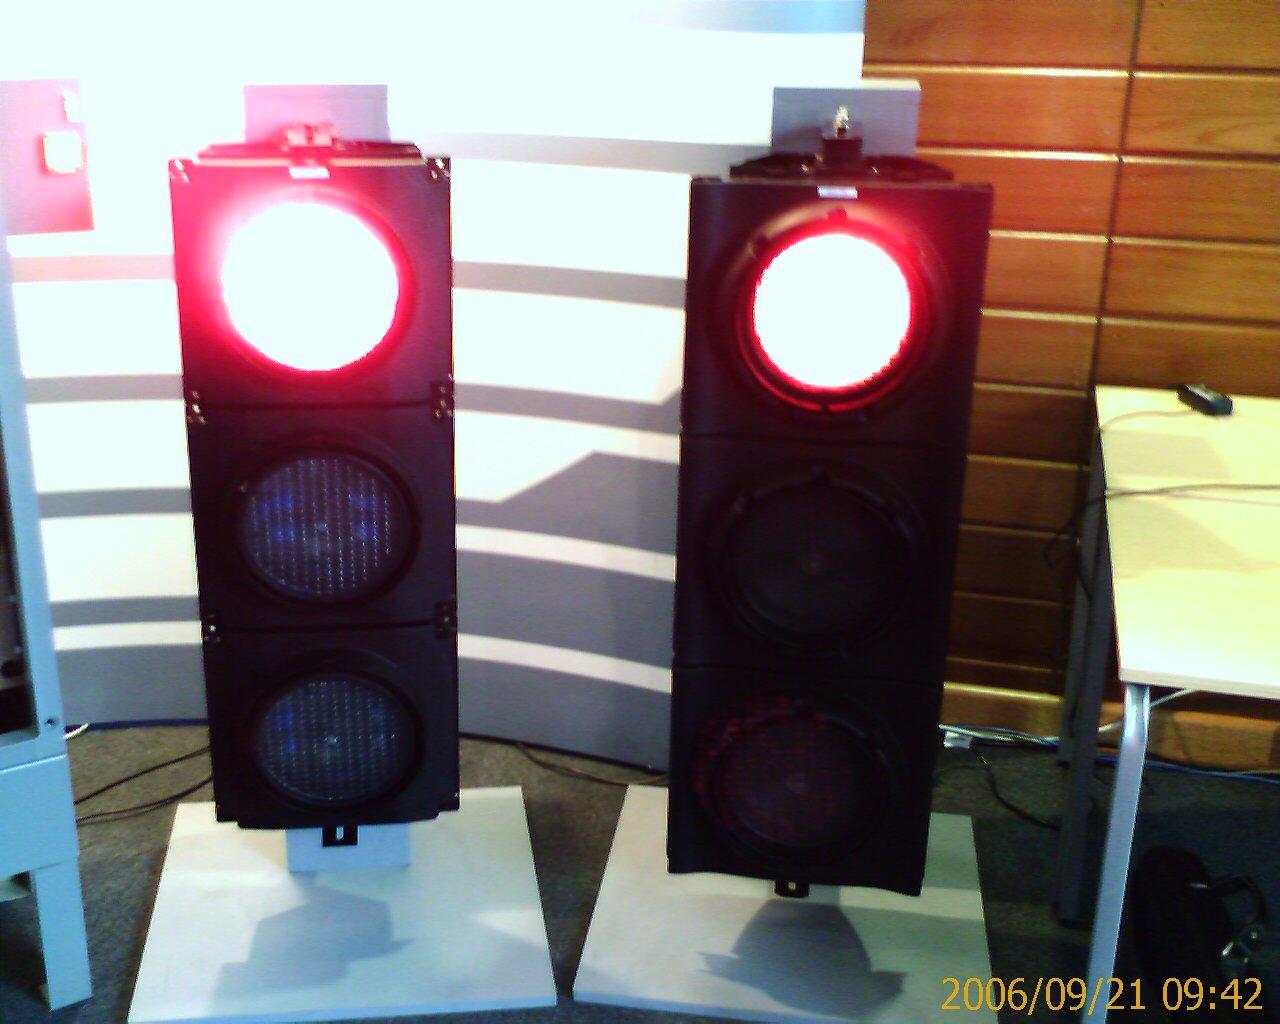 File:PEEK and Siemens LED heads - Coppermine - 7836 jpg